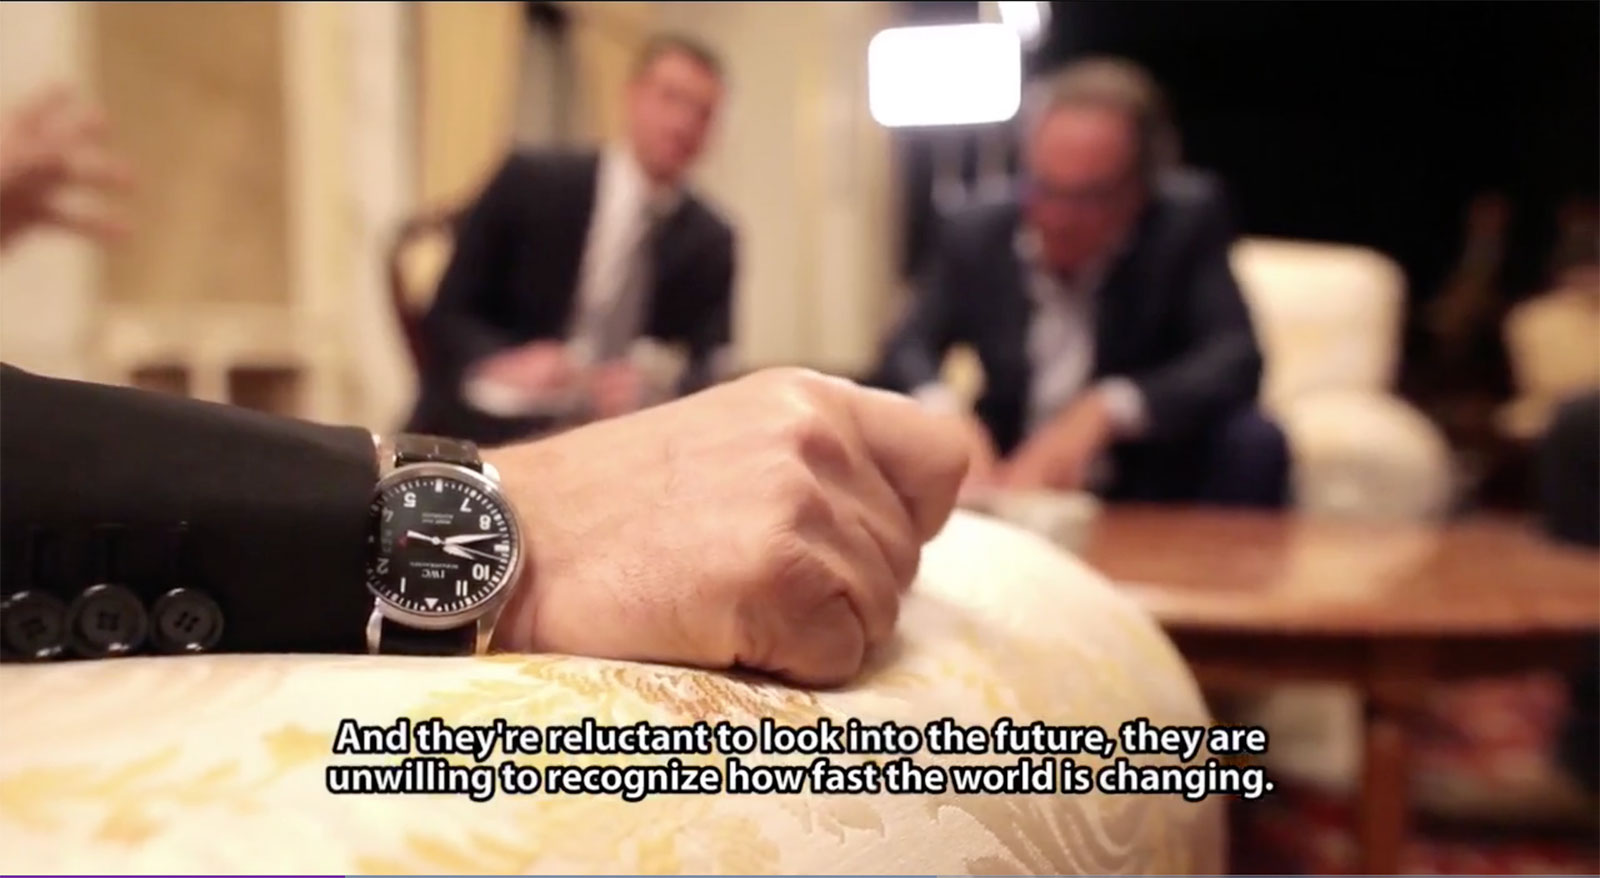 Vladimir Putin IWC Mark XVII 4